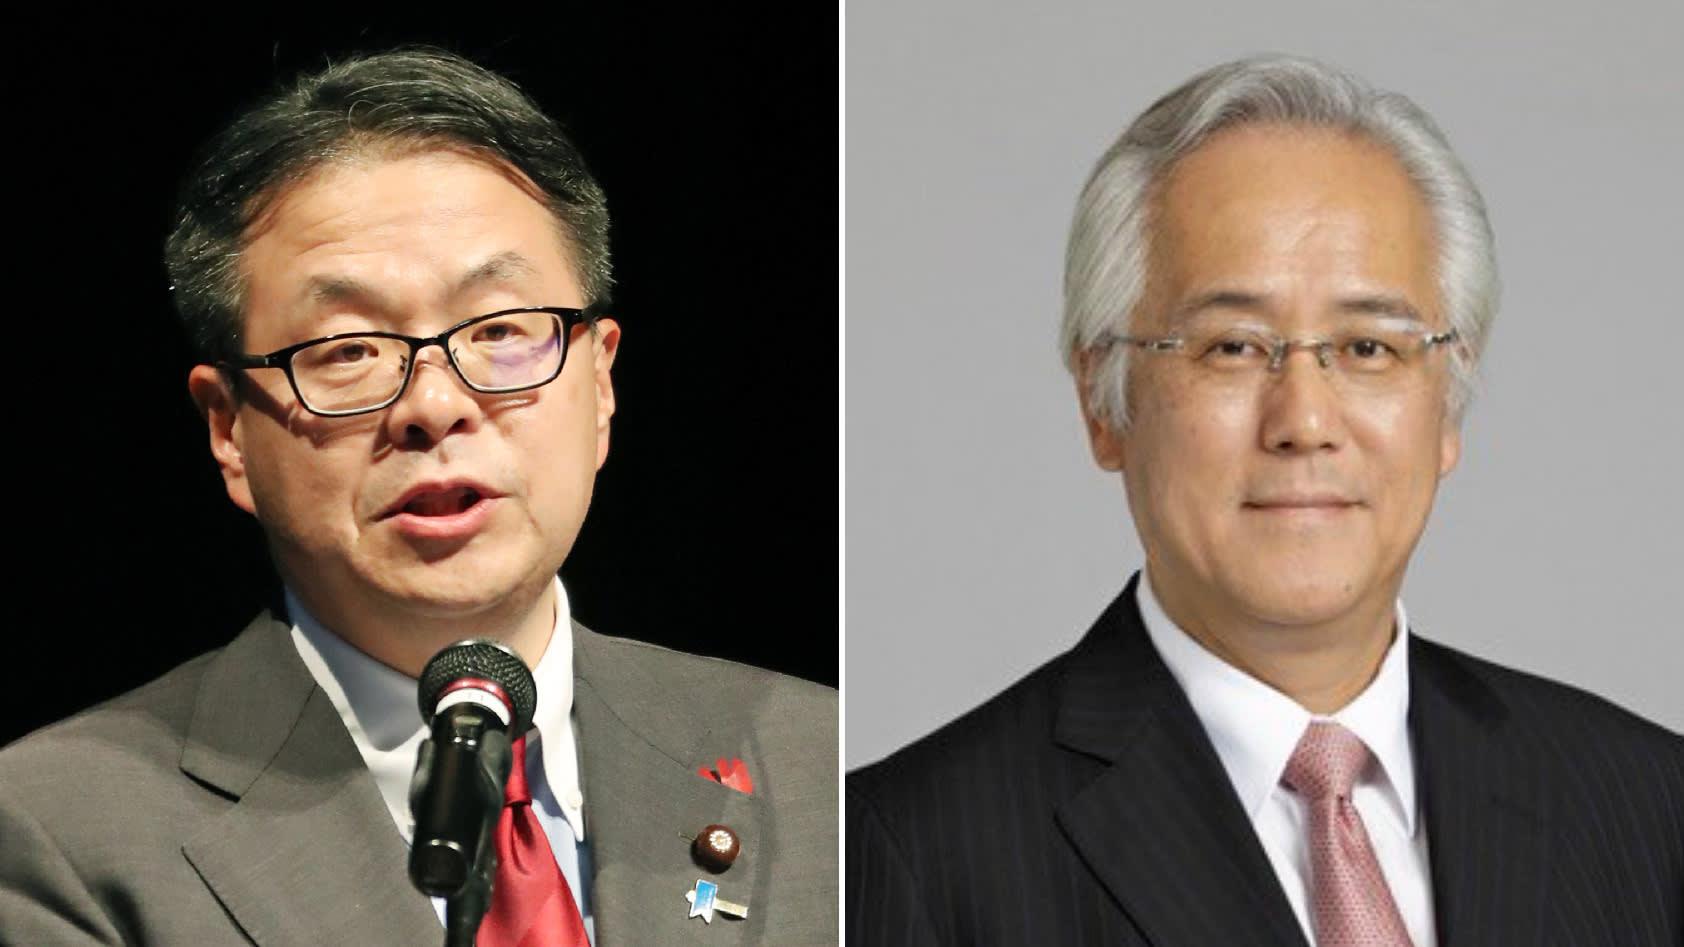 Minister of Economy, Trade and Industry Hiroshige Seko, left, andJIC President Masaaki Tanaka.